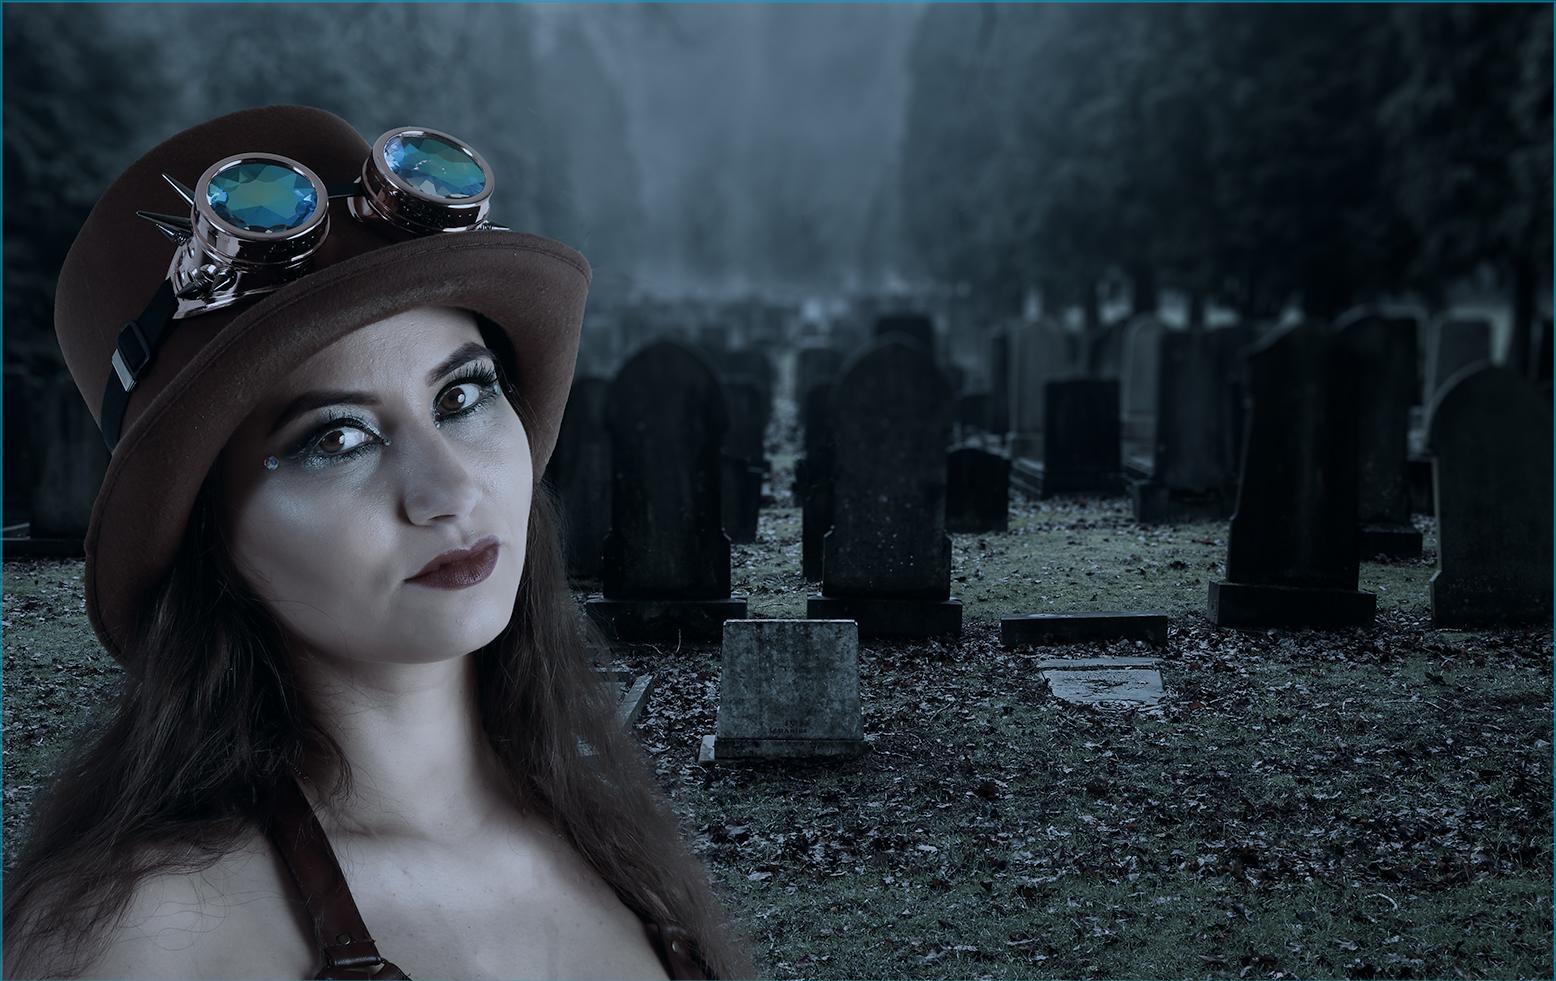 Penelope-in-Graveyard